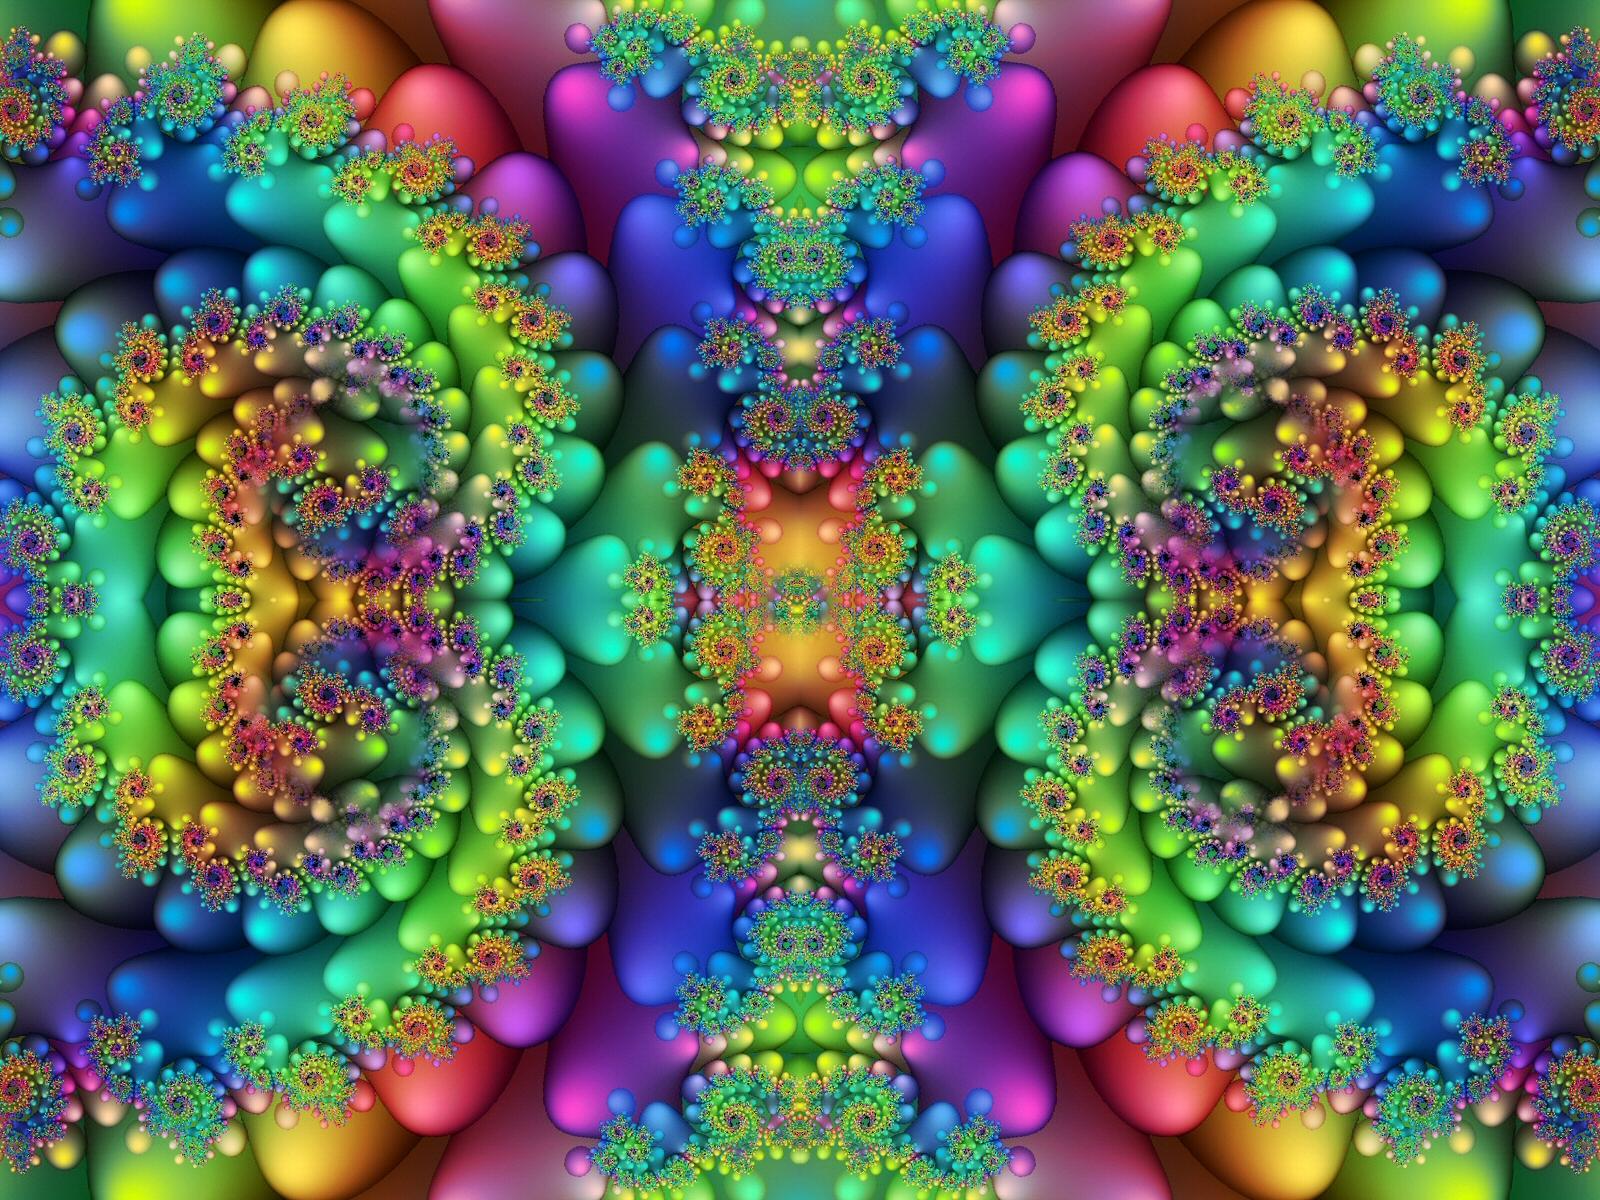 Rainbow Love by Thelma1 on DeviantArt